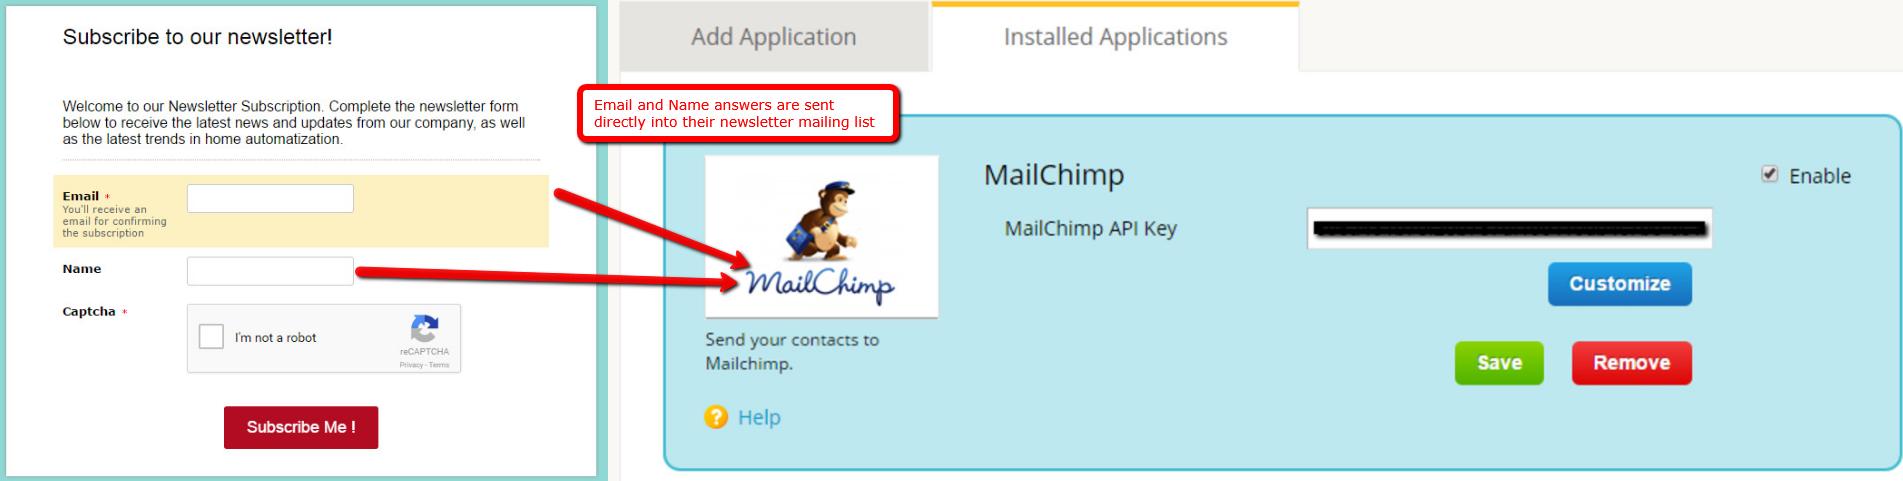 123formbuilder app examples